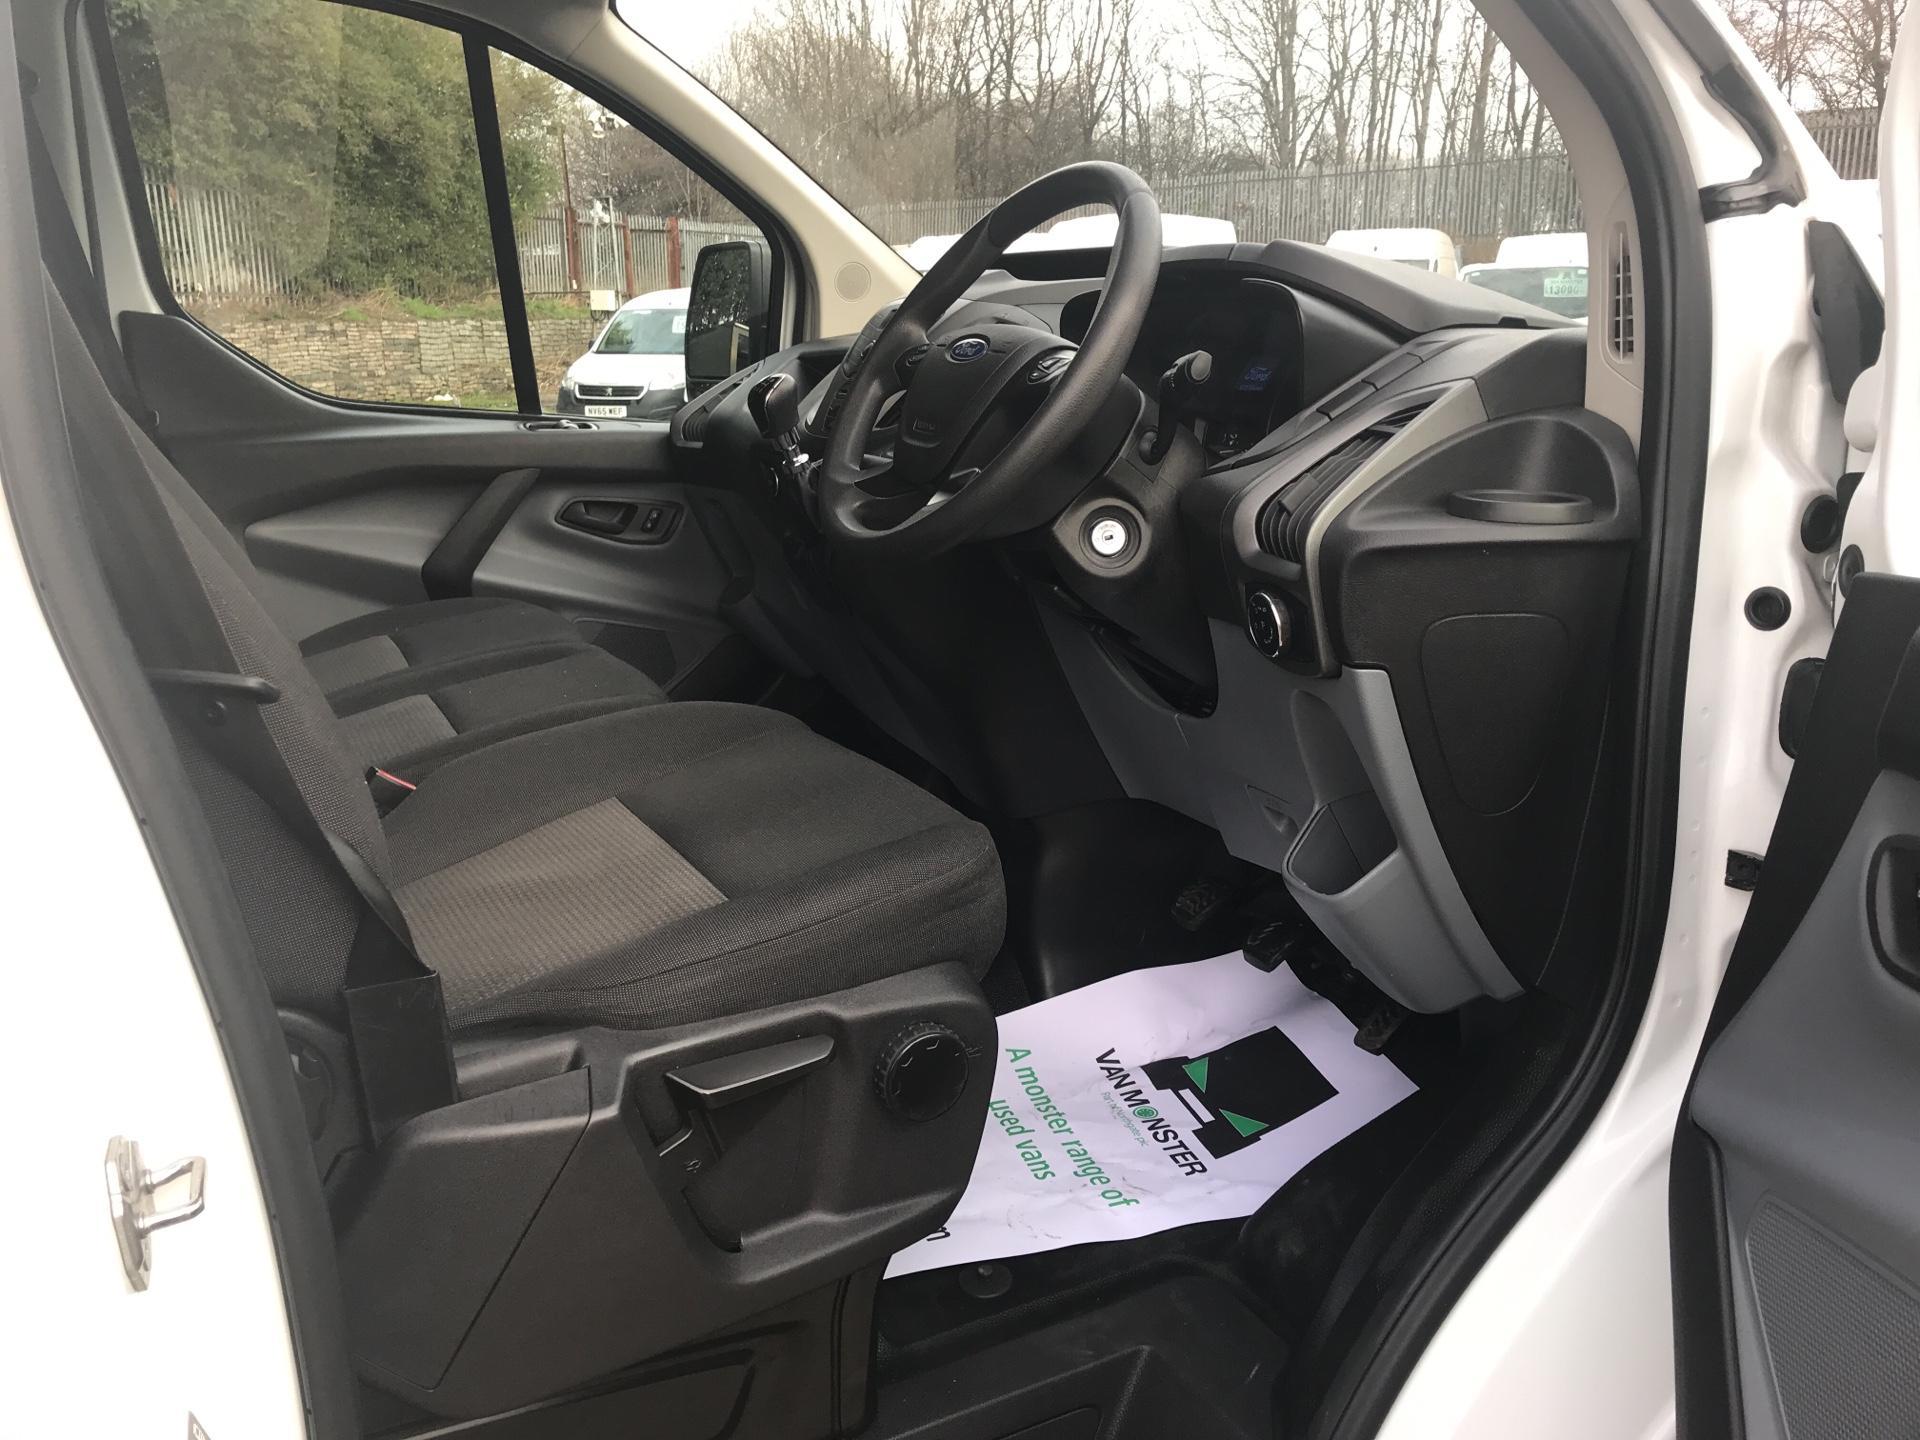 2016 Ford Transit Custom 290 L1 DIESEL FWD 2.2 TDCI 100PS LOW ROOF VAN EURO 5 (NU66HJX) Image 9